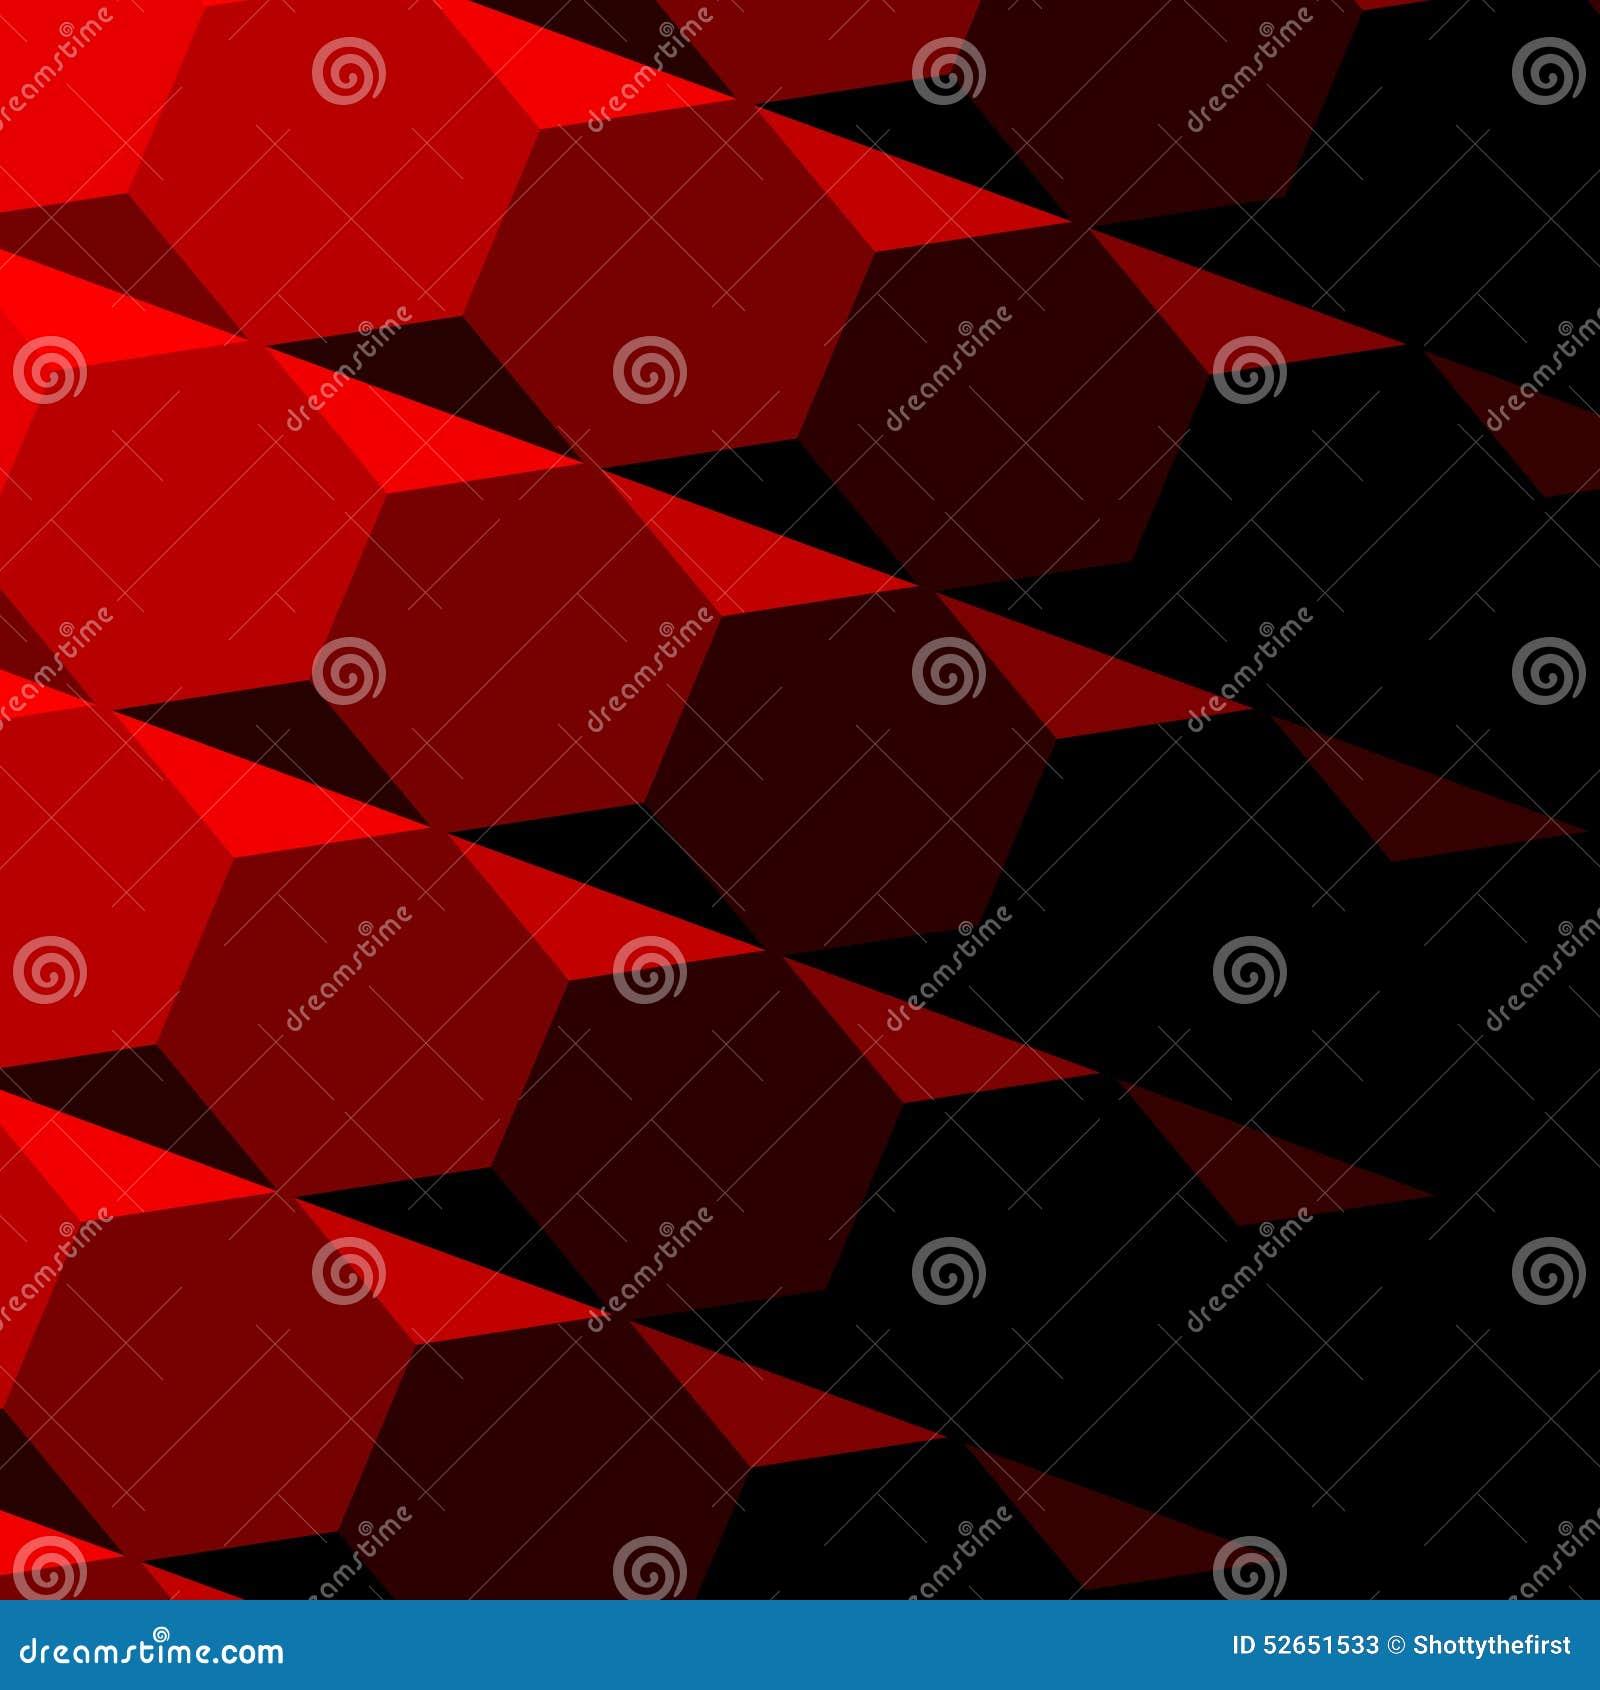 Abstract Red Geometric Texture. Dark Shadow. Technology Background Pattern. Repeatable Hexagon Design. Digital 3d Image. Tilt.